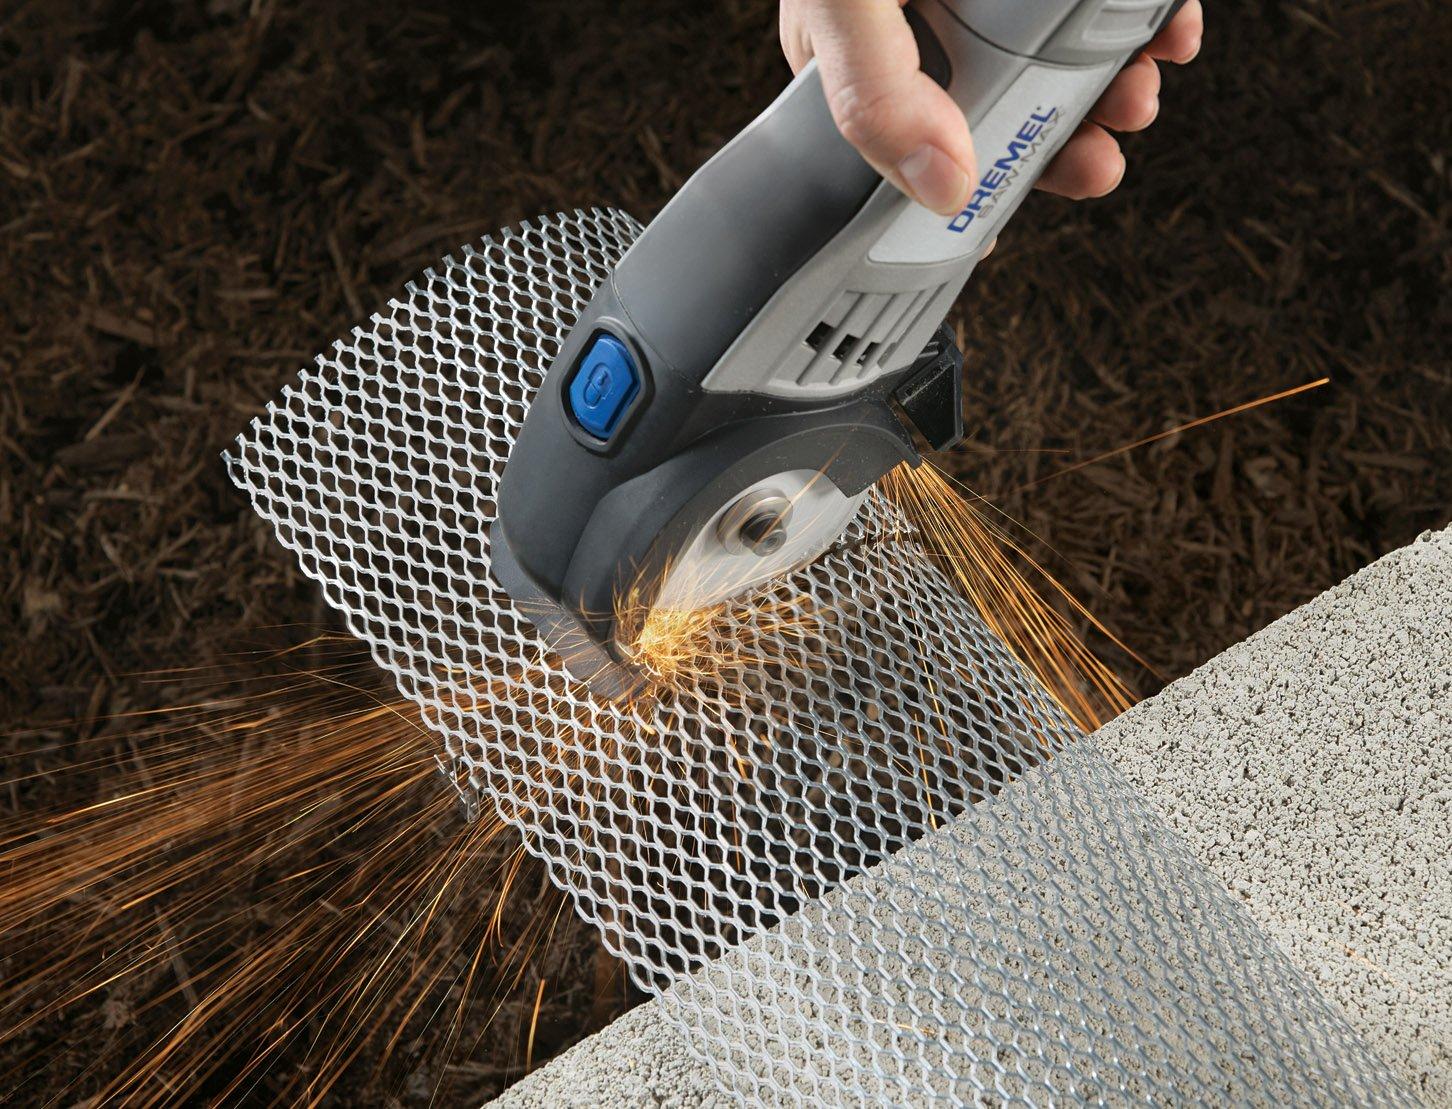 Dremel sm20 03 saw max tool kit power circular saws amazon greentooth Image collections